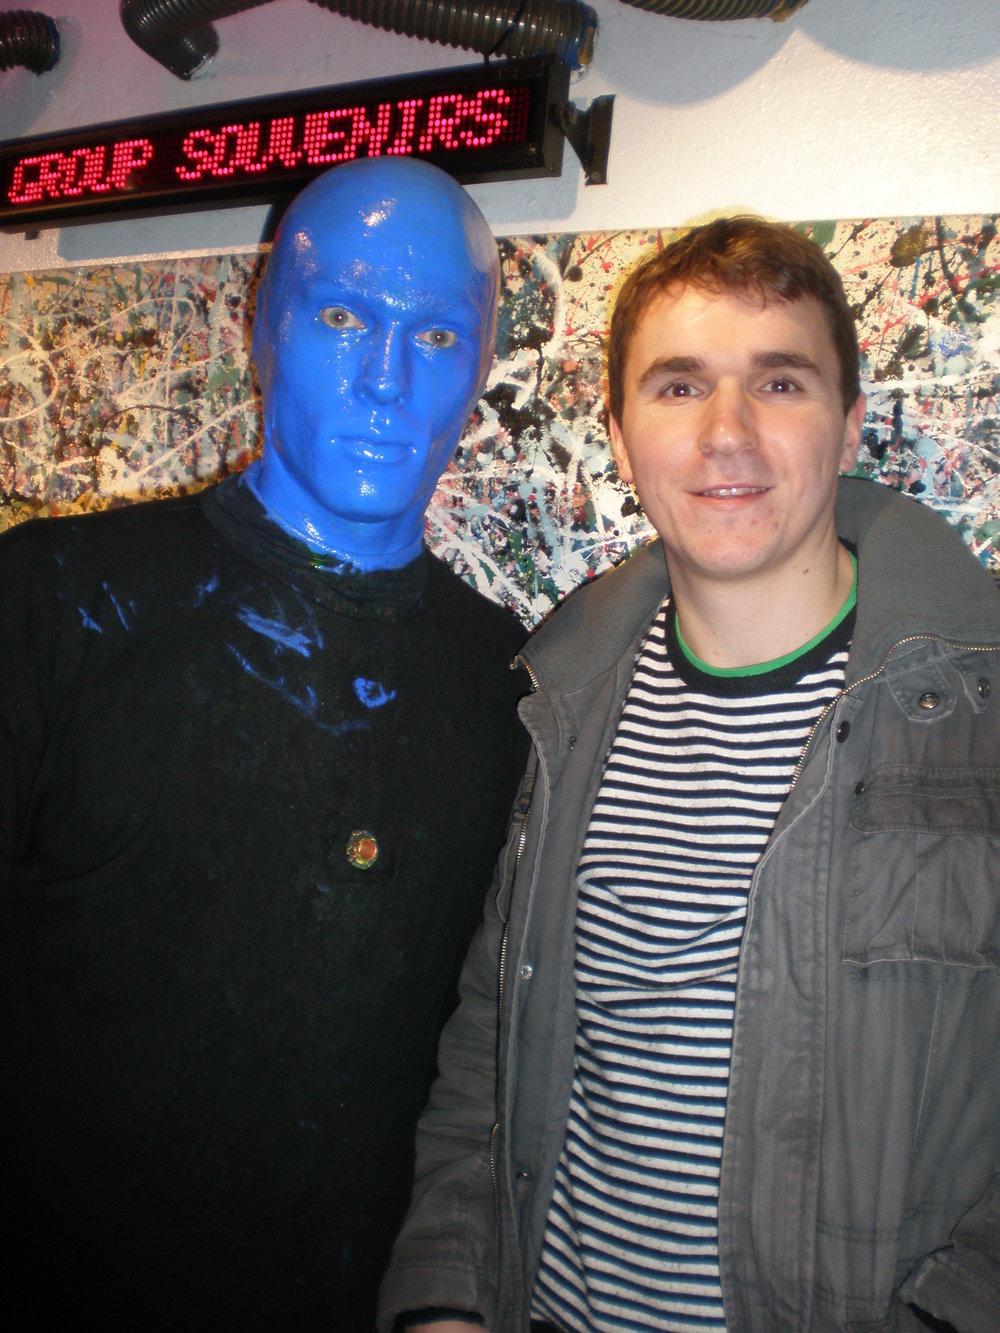 scott-with-a-legendary-blue-man-in-boston-usa_5047489728_o.jpg